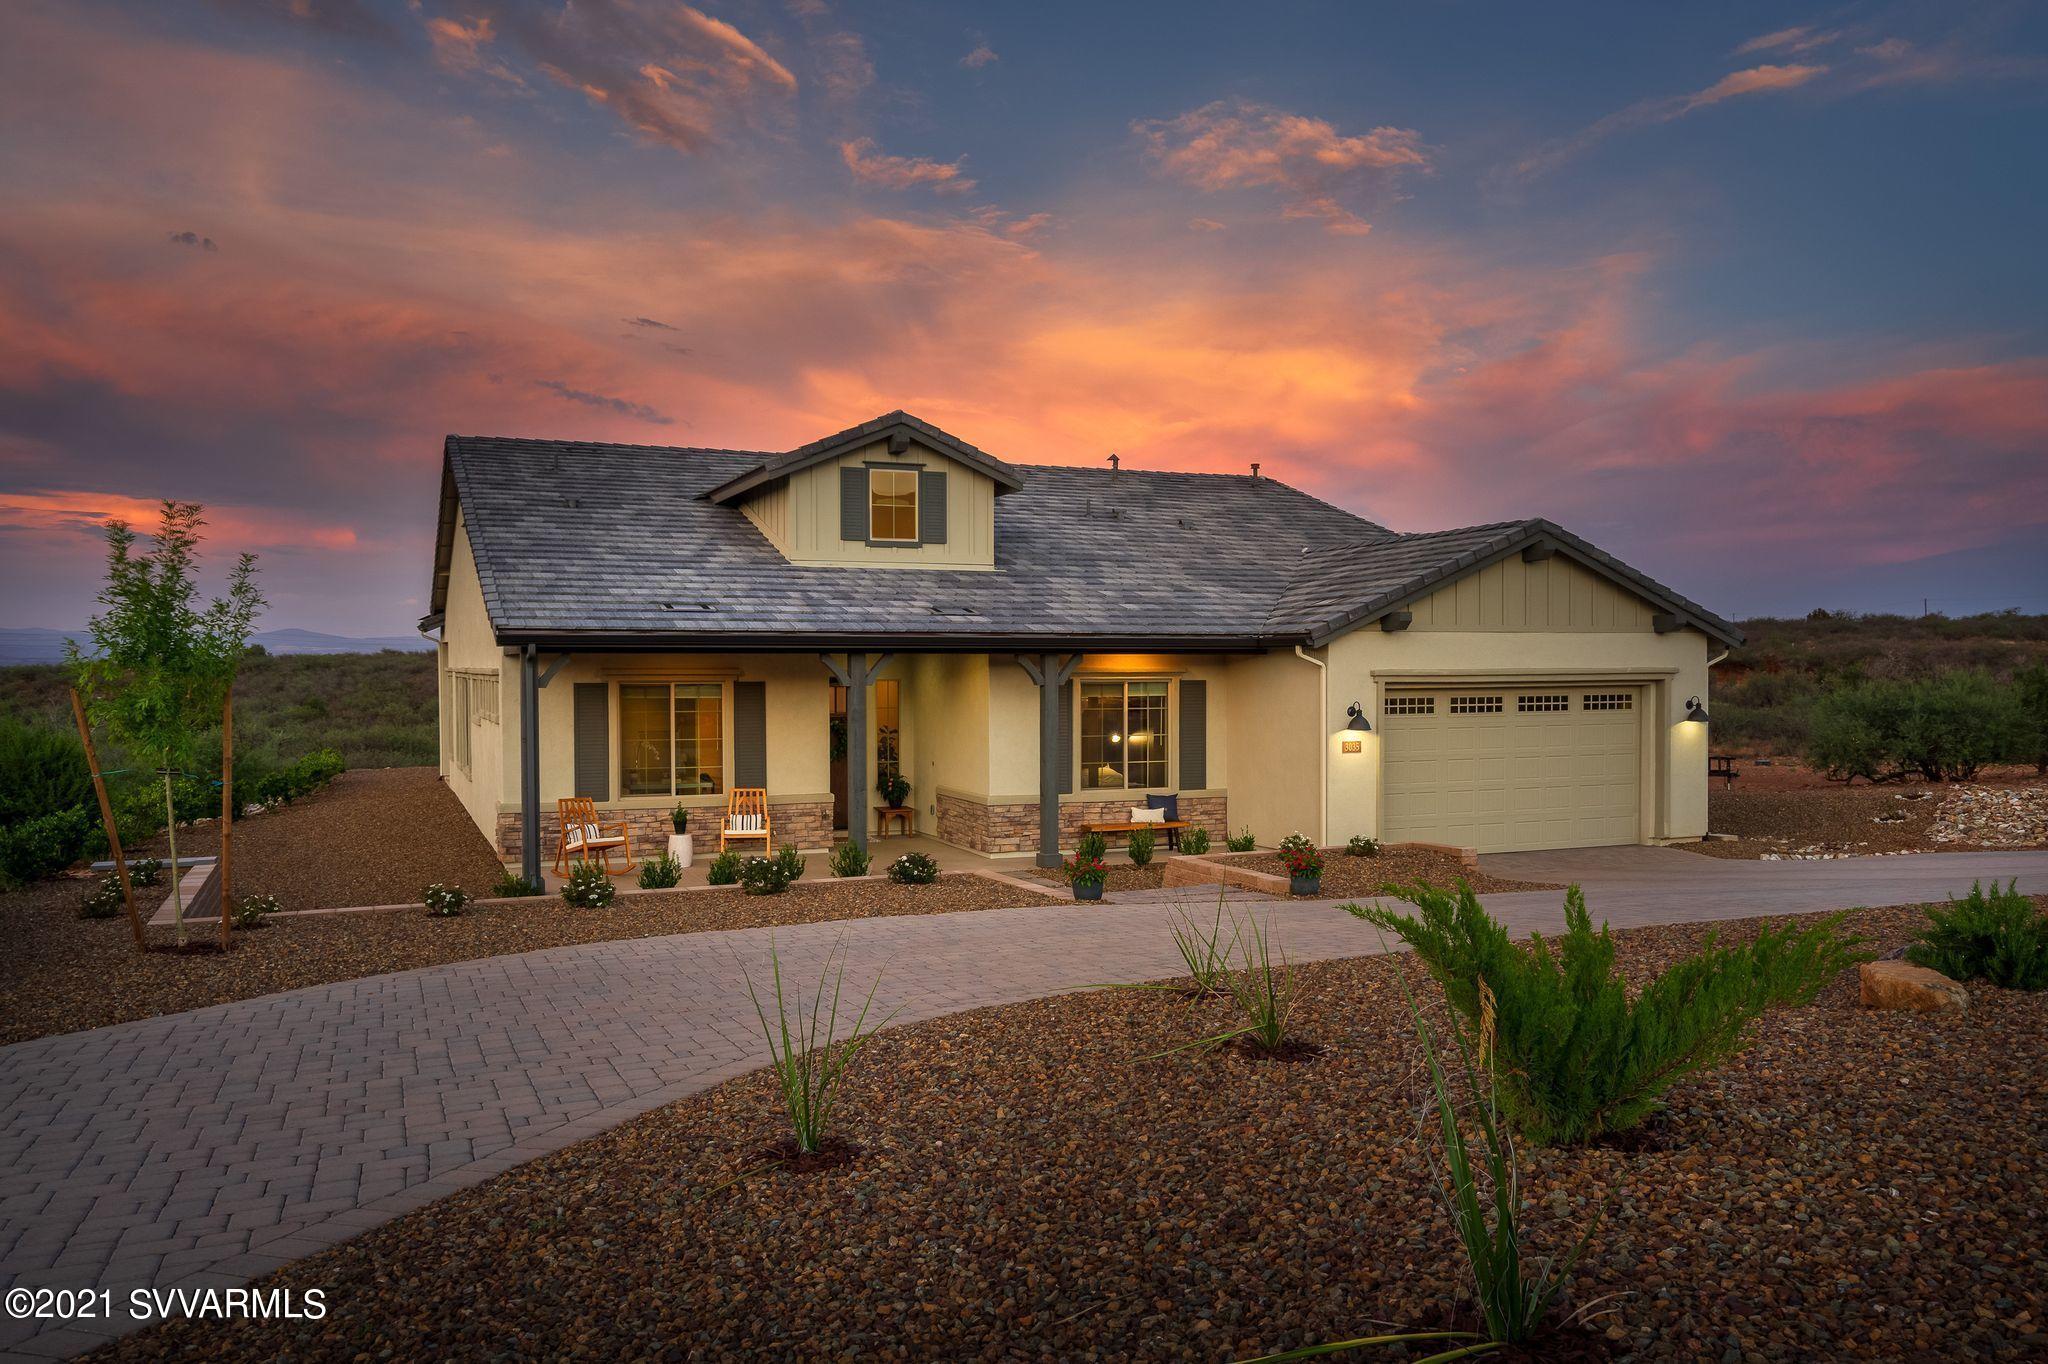 3035 S Quail Canyon Rd Cottonwood, AZ 86326